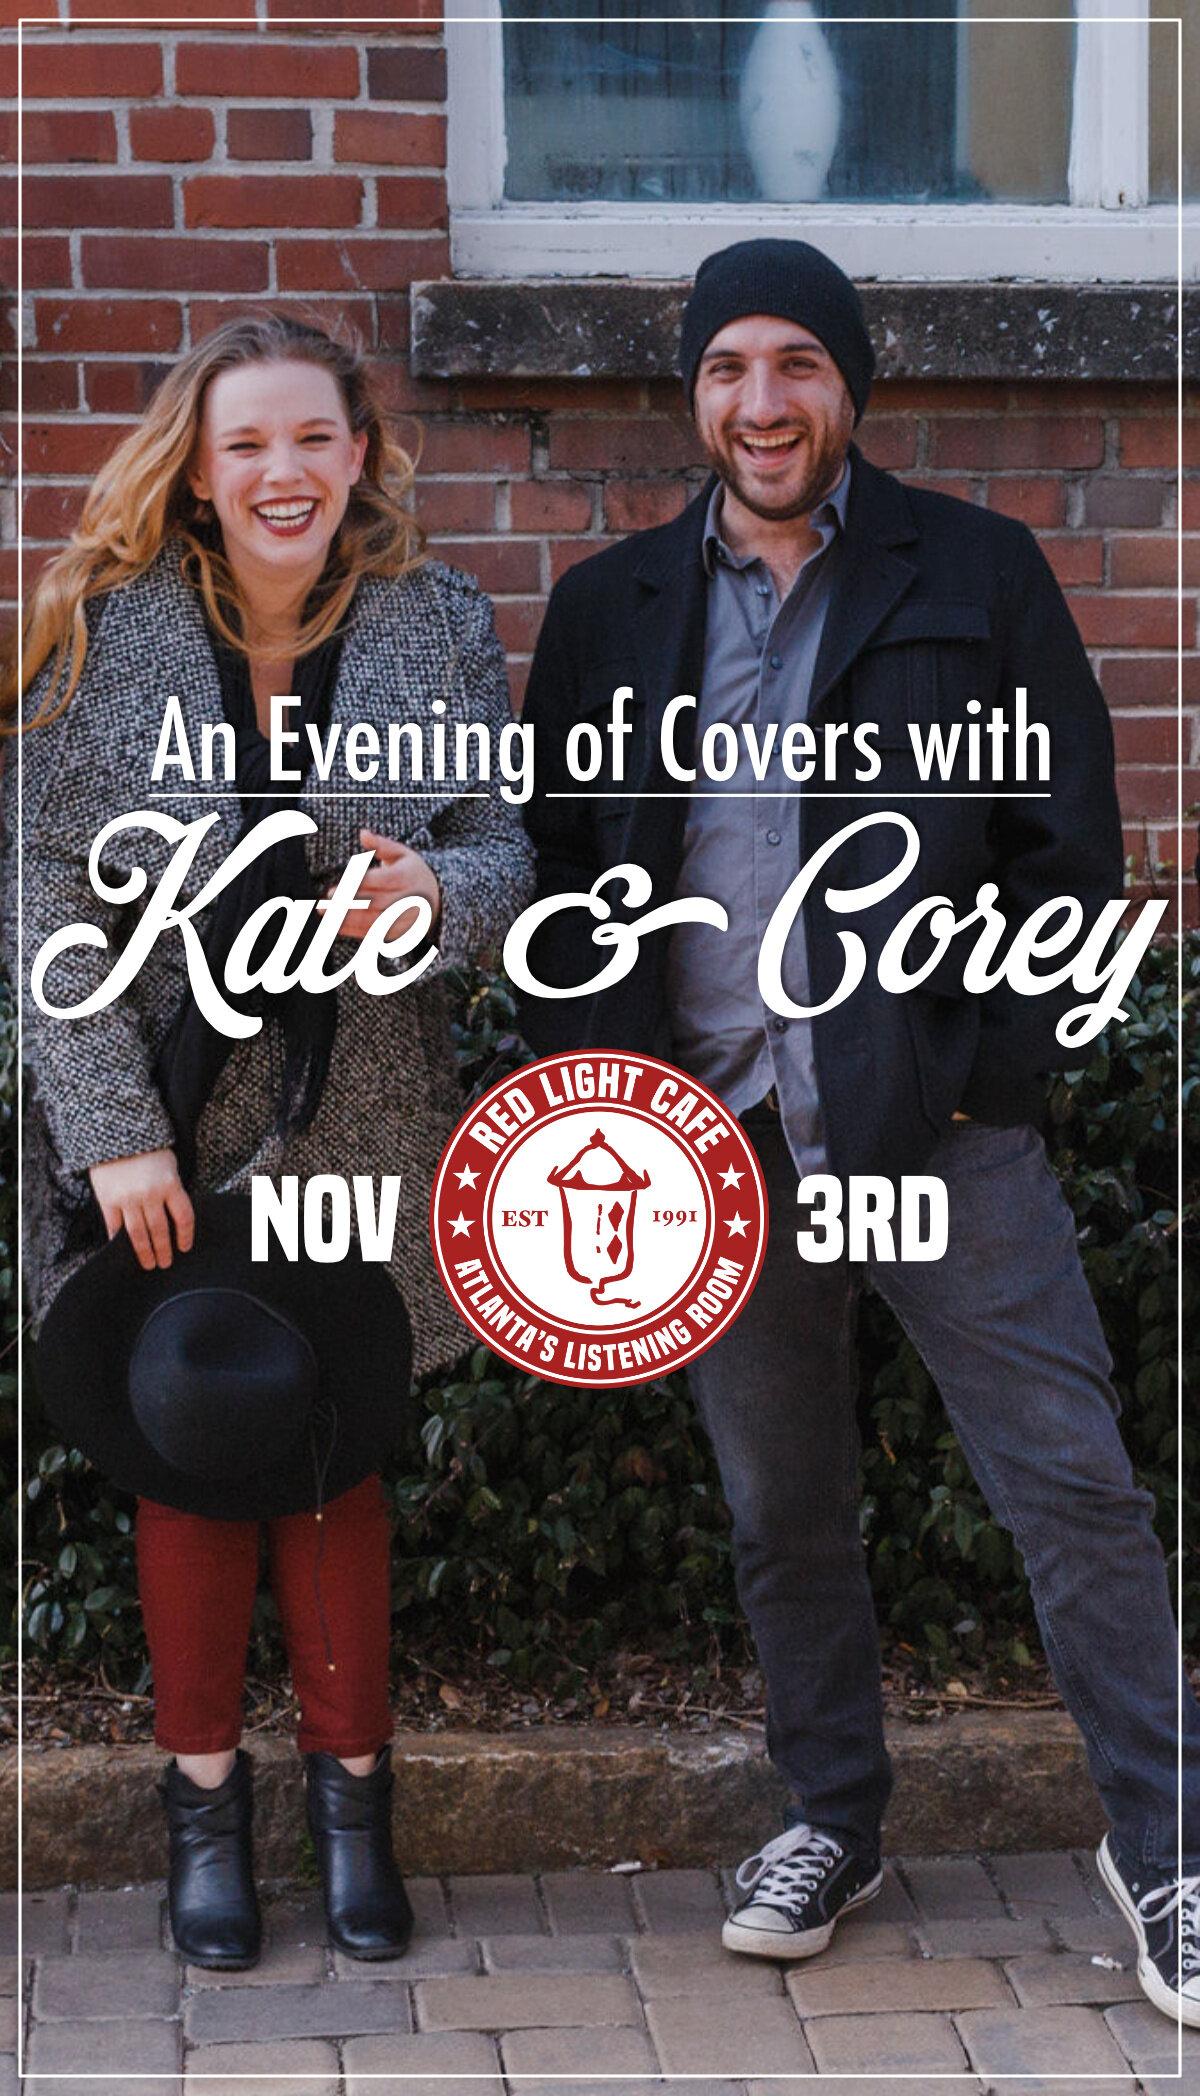 An Evening of Covers with Kate & Corey — November 3, 2019 — Red Light Café, Atlanta, GA